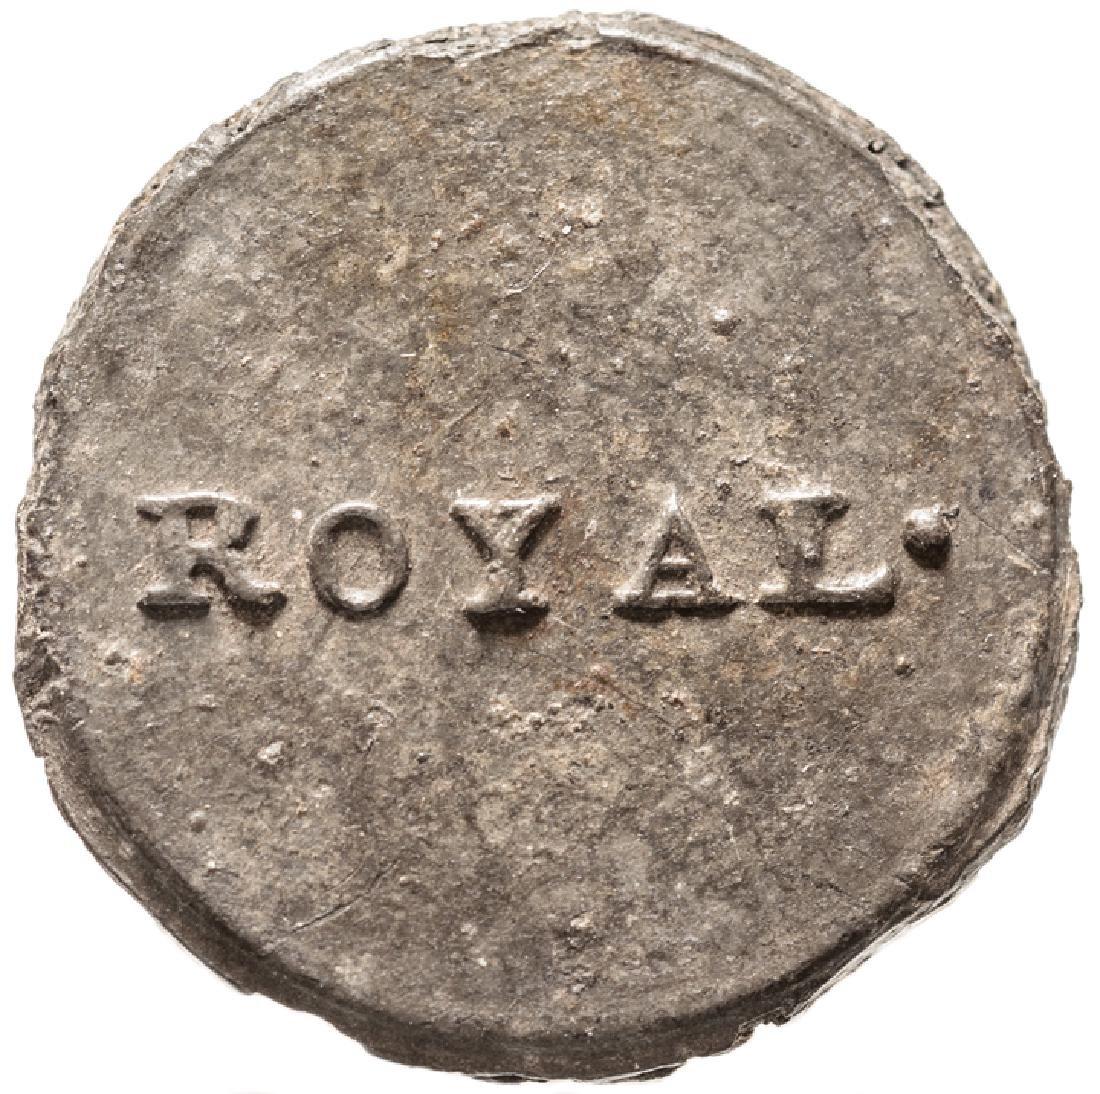 c. 1775 ROYAL Provincial British Loyalist Button